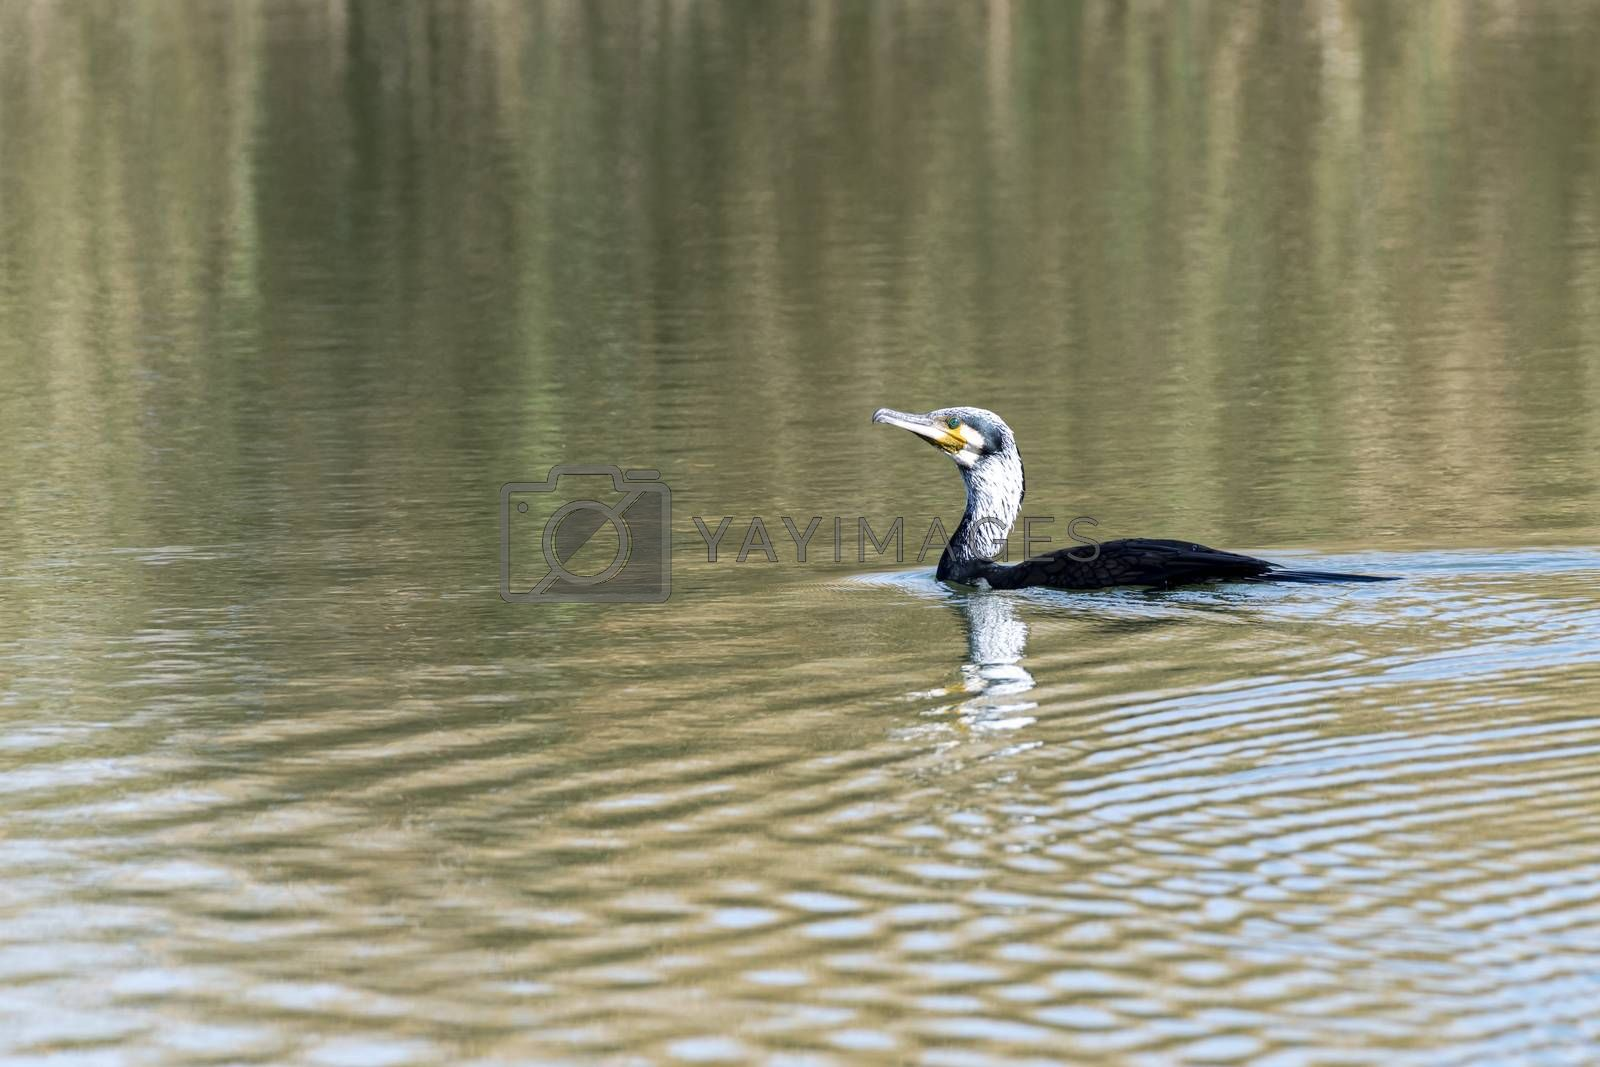 Waterbird or aquatic bird seen near Al Qudra Lakes, Dubai, United Arab Emirates (UAE), Middle East, Arabian Peninsula